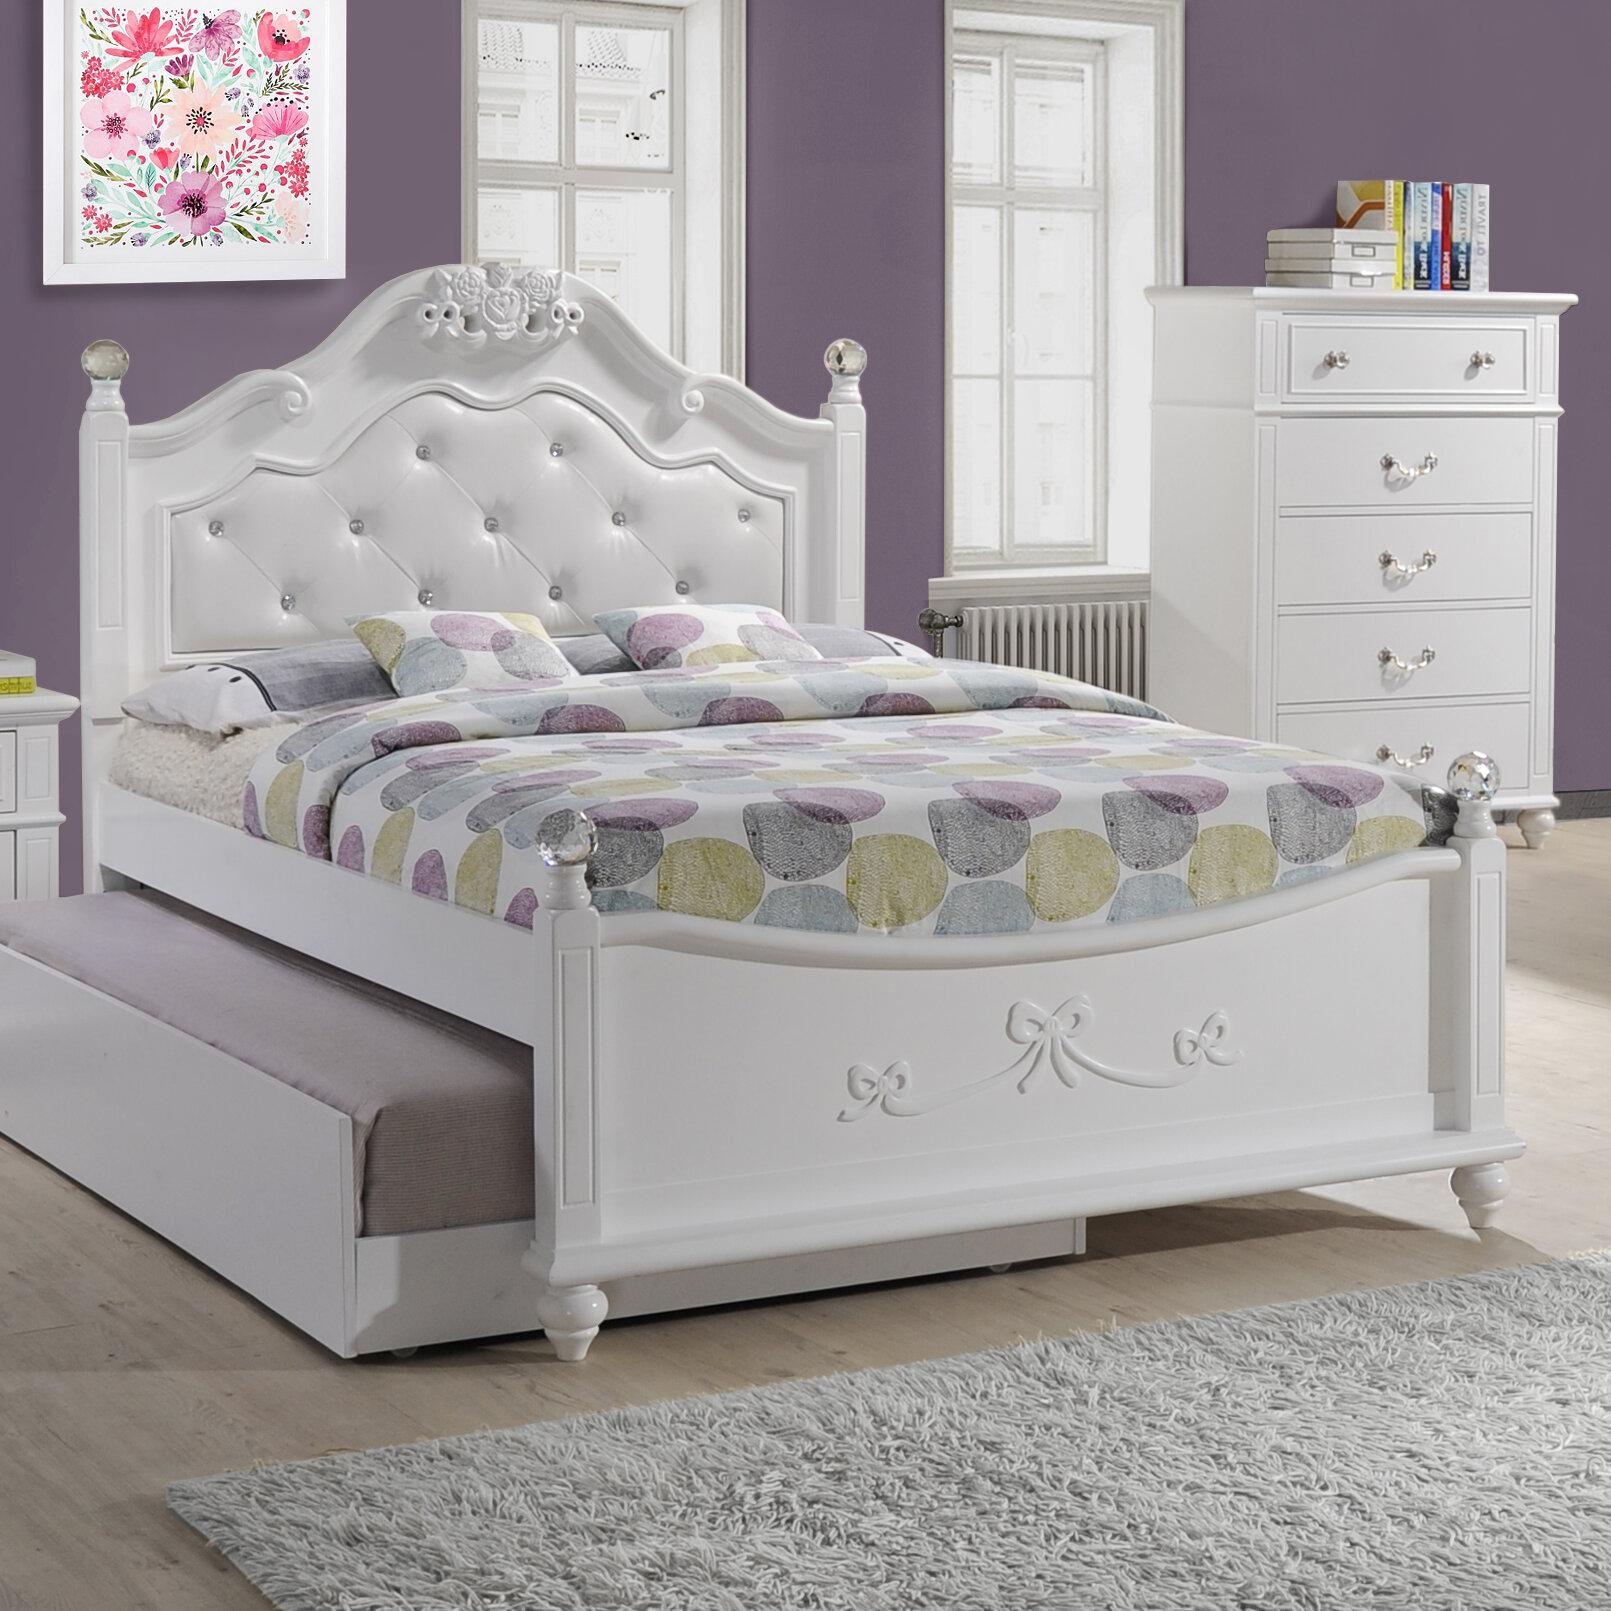 Viv Rae Lydia Tufted Upholstered Storage Platform Bed Reviews Wayfair